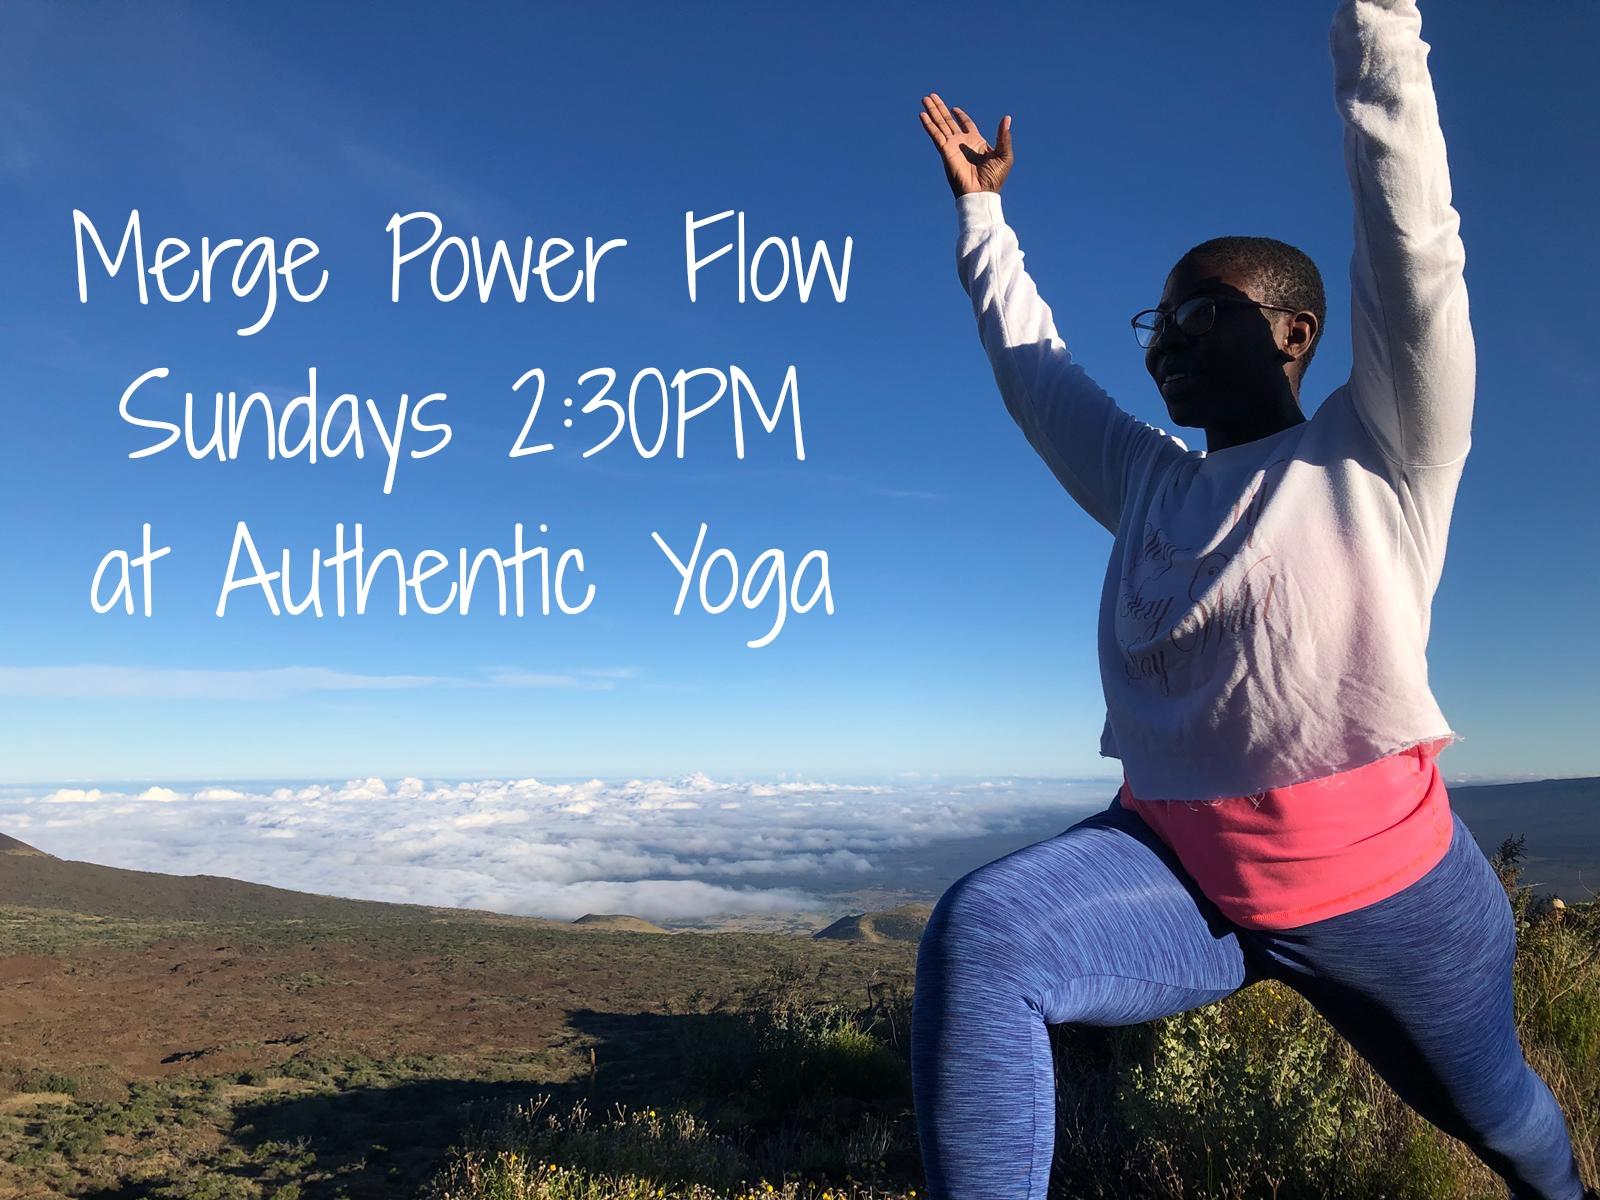 Merge Power Flow Yoga